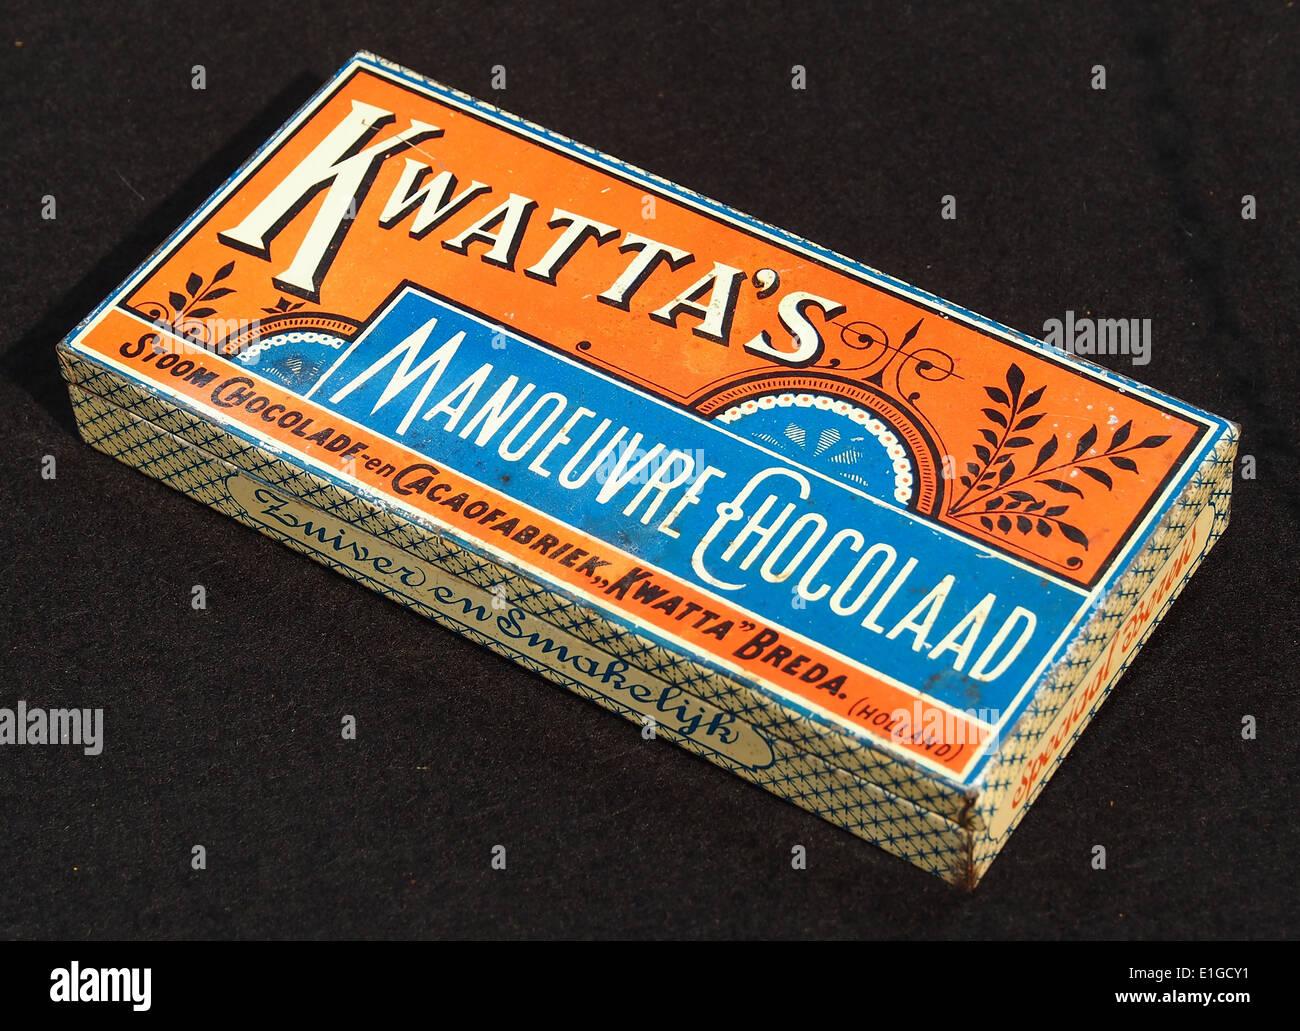 Kwattas Manoeuvre Chocolaad blik, foto7 - Stock Image